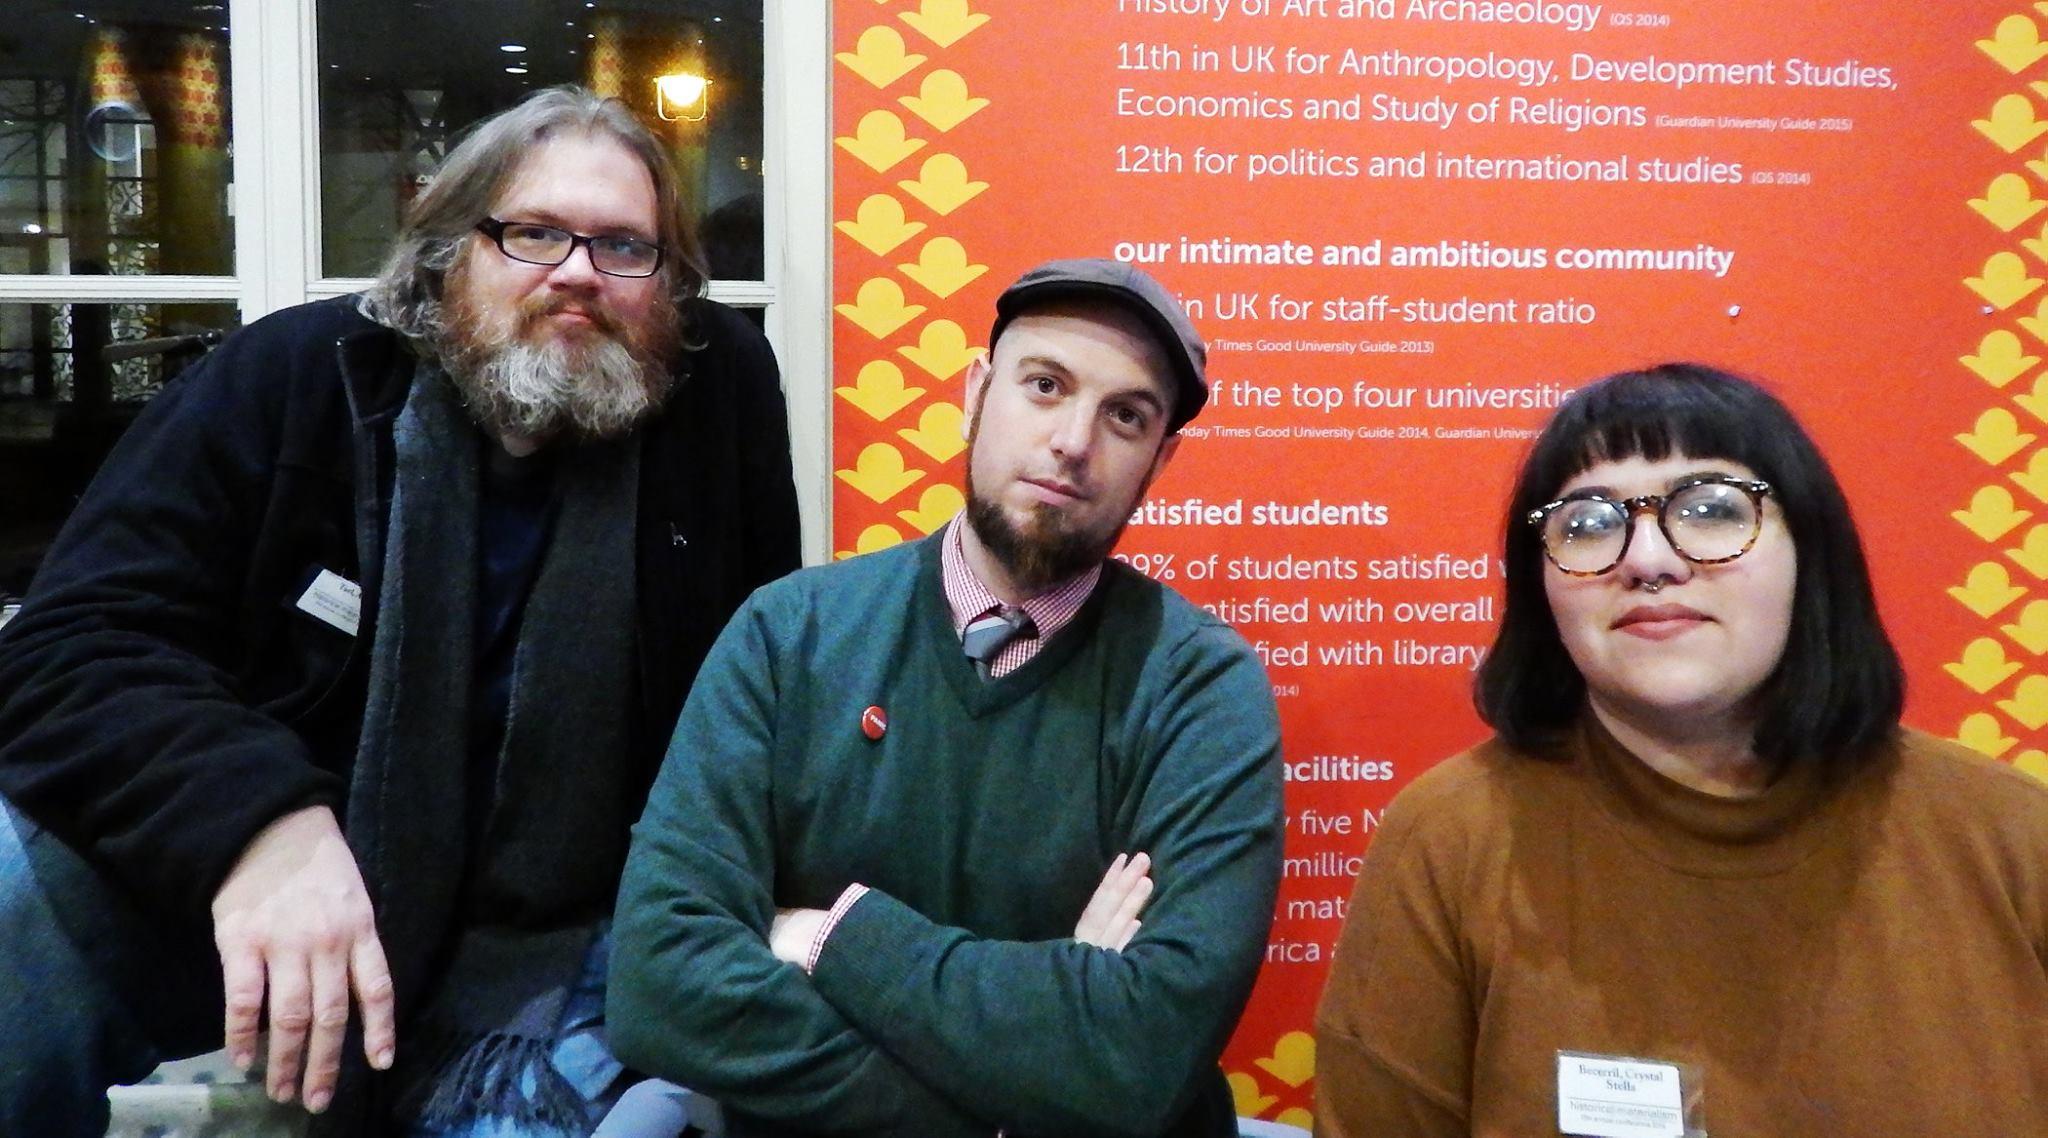 Adam Turl, Alexander Billet and Crystal Stella Becerril at Historical Materialism London (2016).